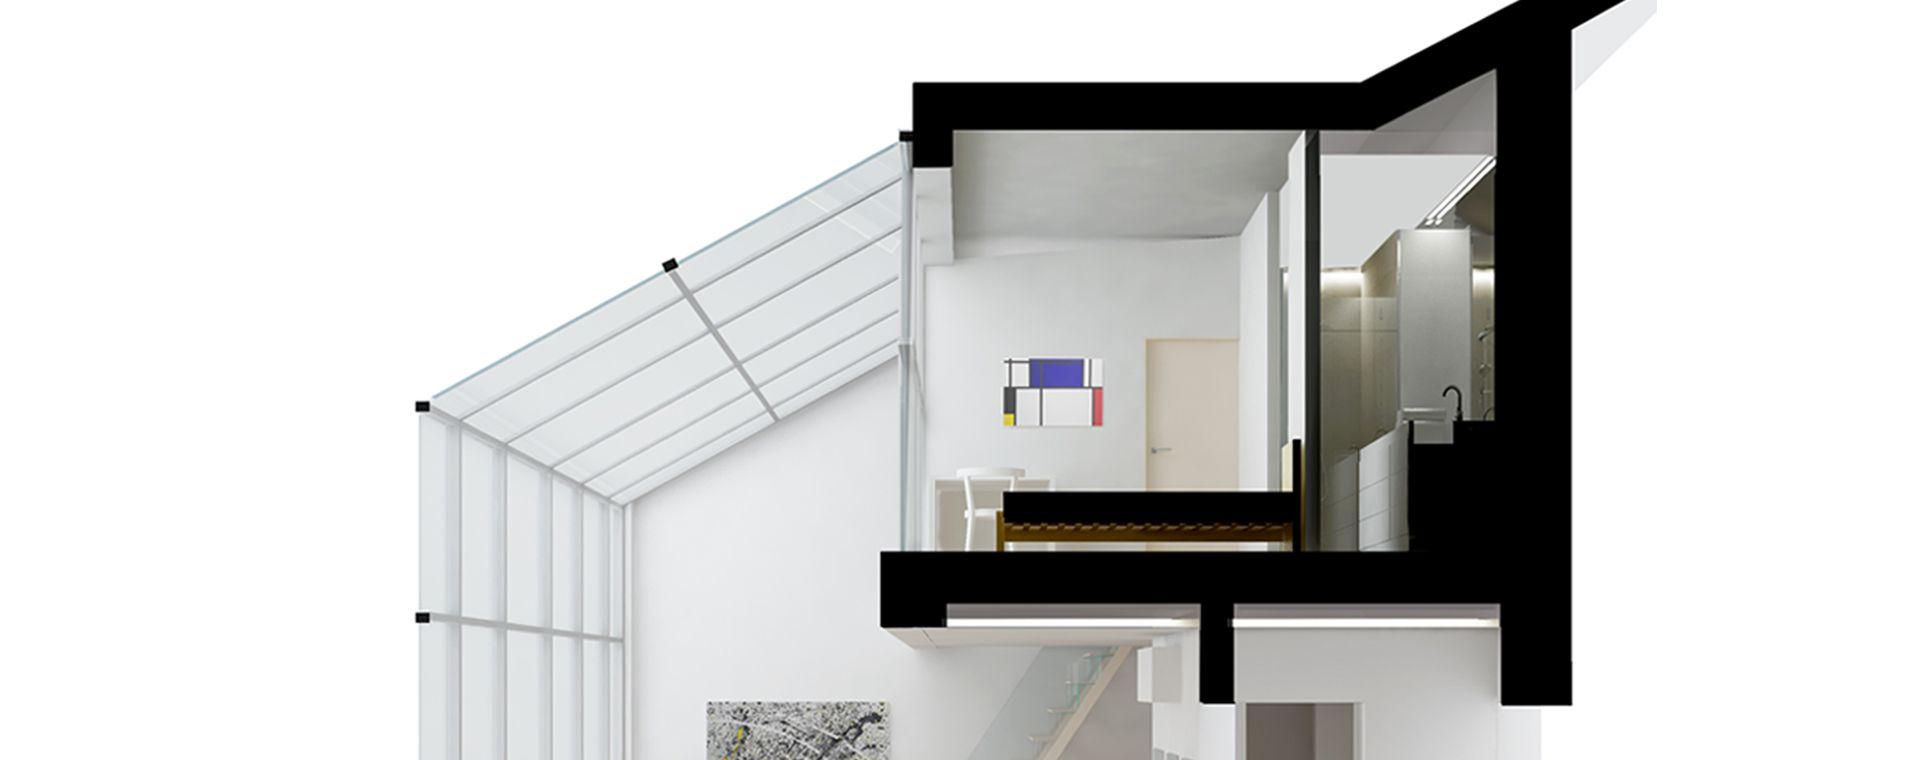 Návrh studie duplexu a realizace na Praze 8, duplex, mezonet, Na Kopečku 2, Praha 8, 2017-2018, CZ